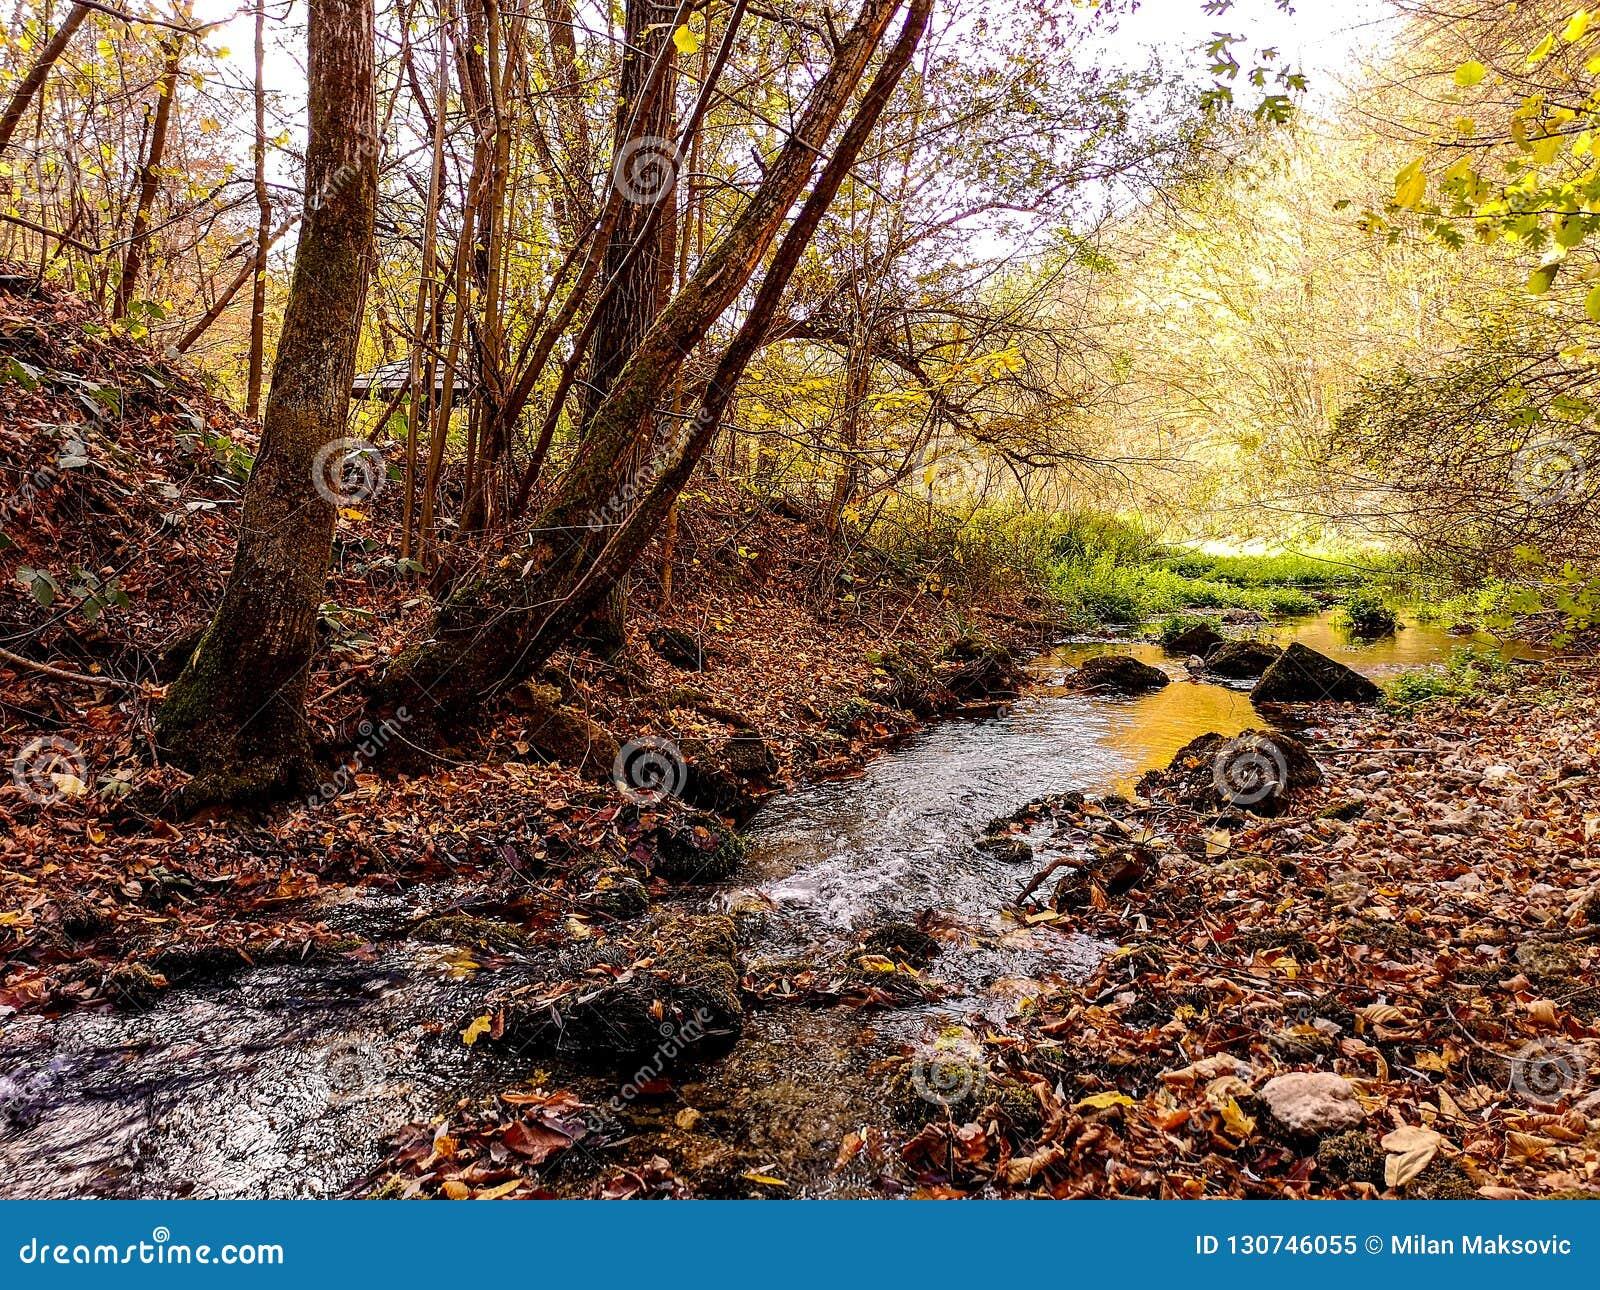 Naturen parkerar Grza nära Paracinen, Serbien